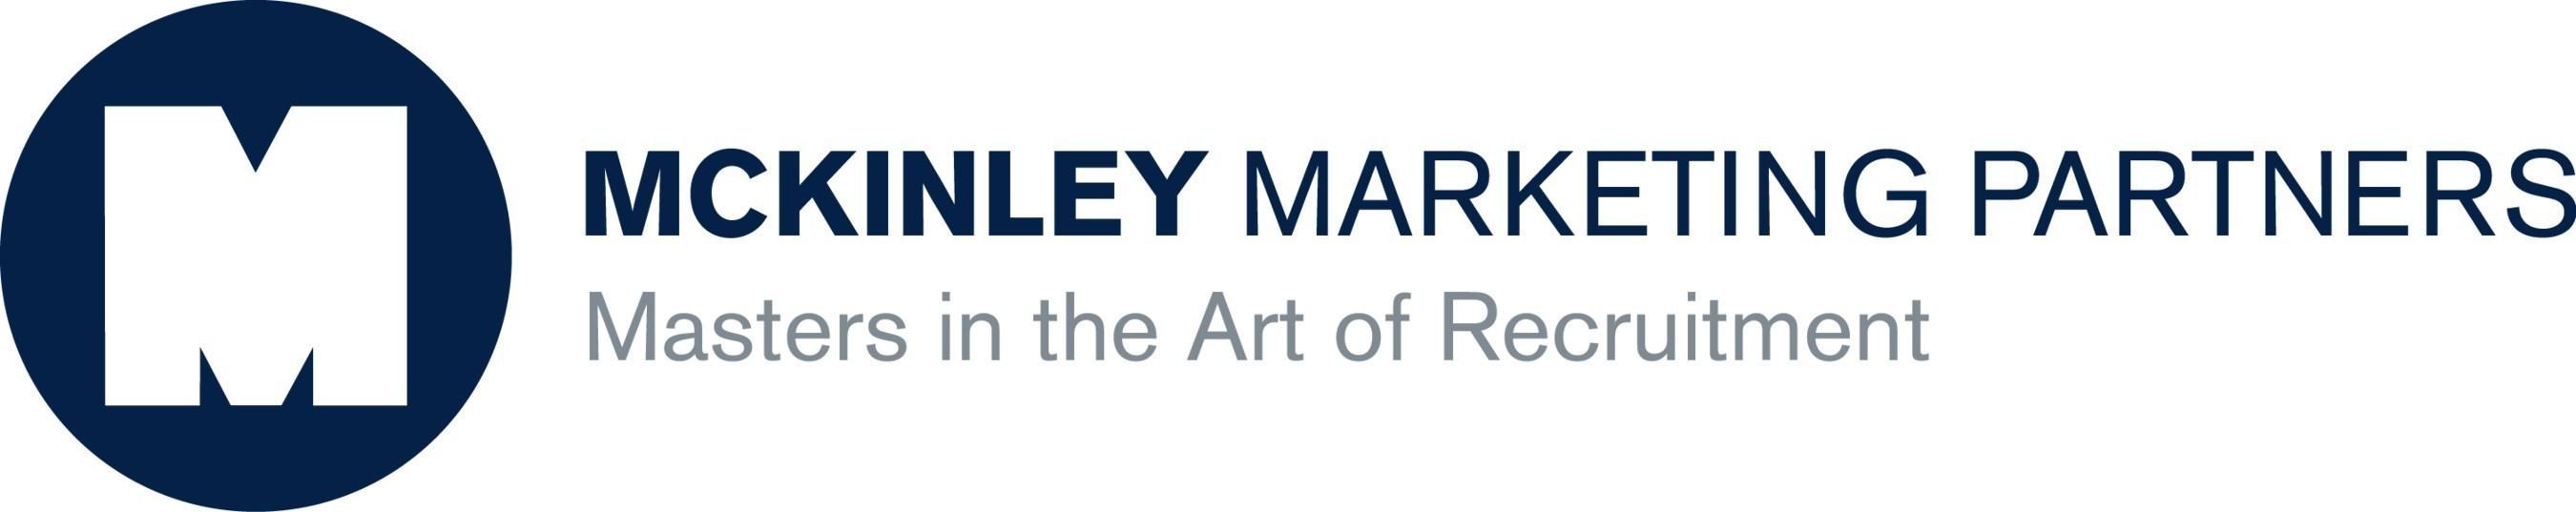 McKinley Marketing Partners, Inc.